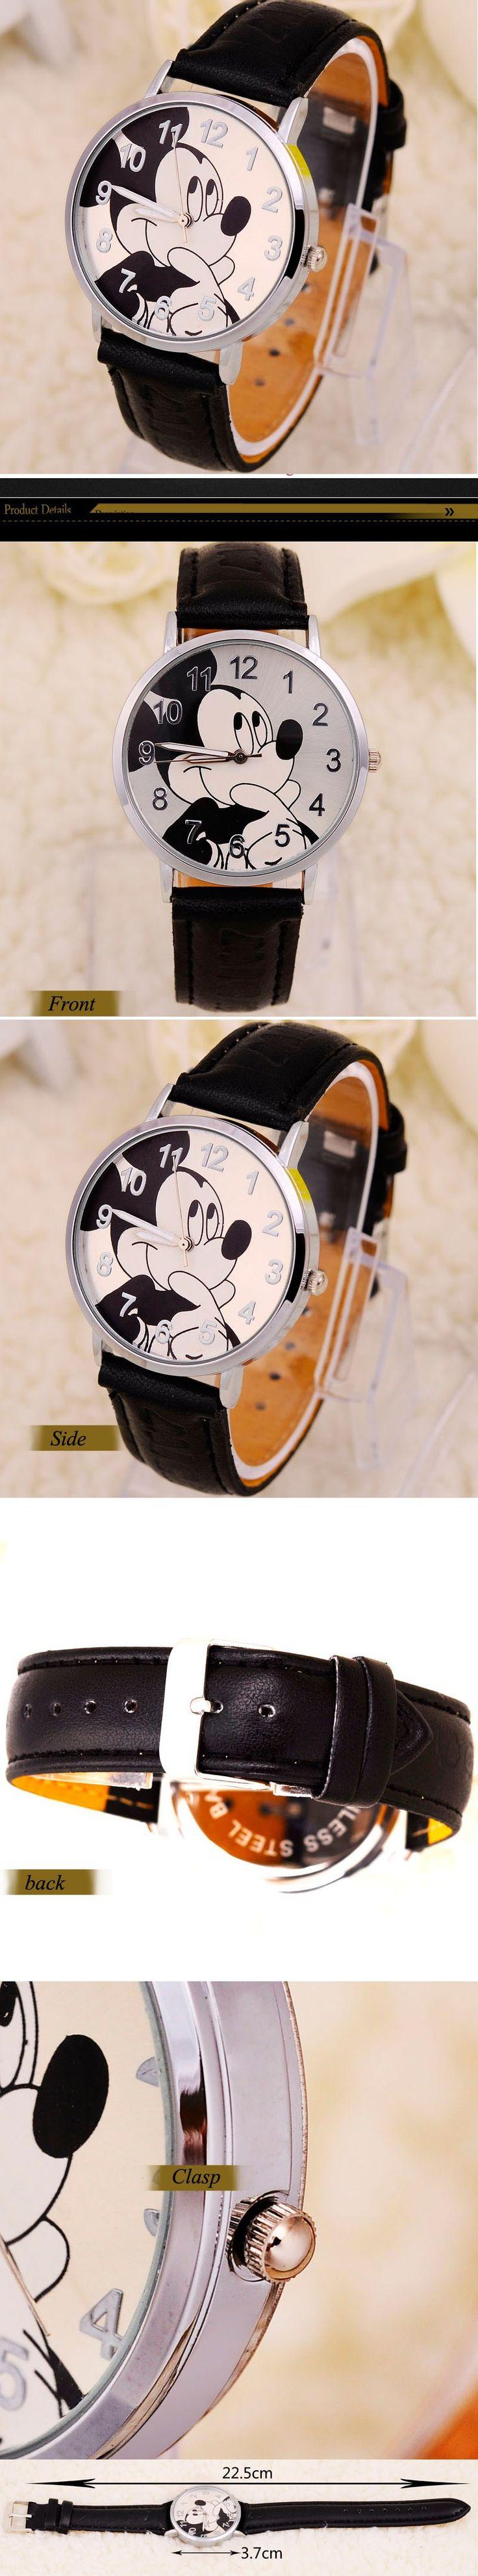 Mouse cartoon watch ladies watches youngsters quartz wristwatch baby boy clock woman reward relogio infantil reloj ninos montre enfant - Silver Jewellery 925 - SHOP NOW